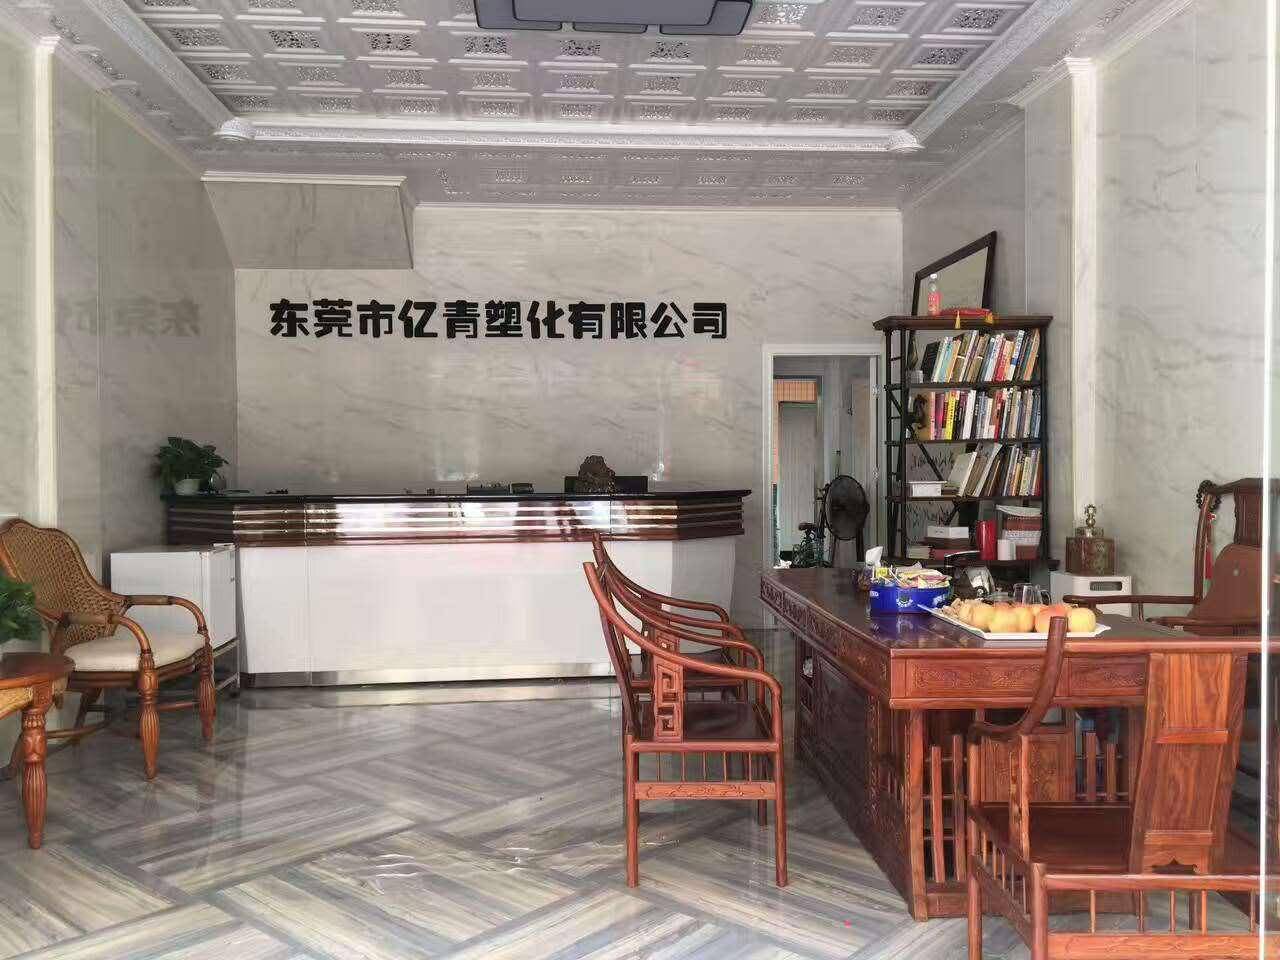 PET价格  广东pet价格、供应常州华润pet聚酯切片、拉丝片材原料8863、东莞亿禾